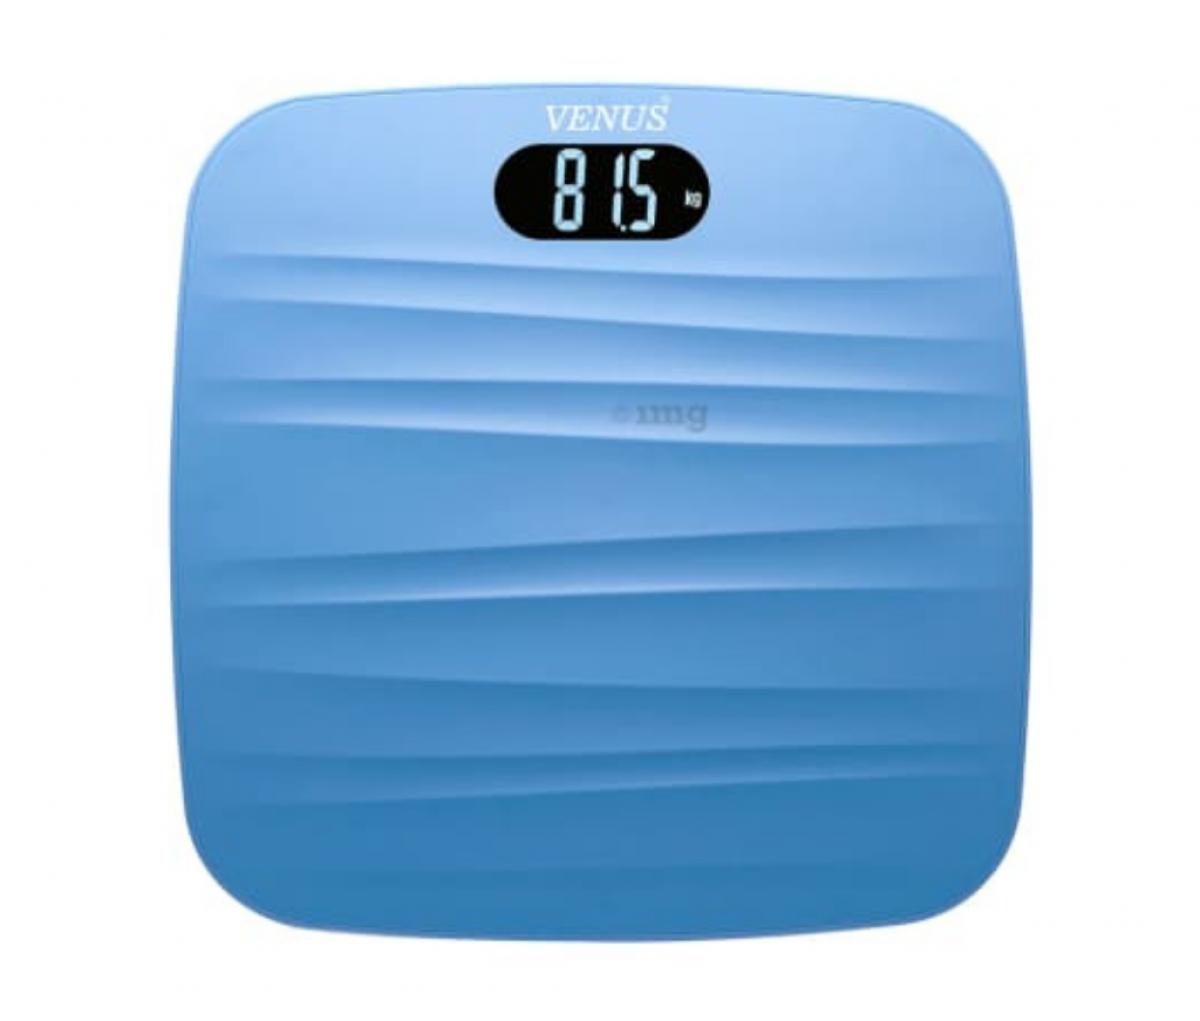 Venus Digital LCD Weighing Scale Blue Prime Lightweight ABS